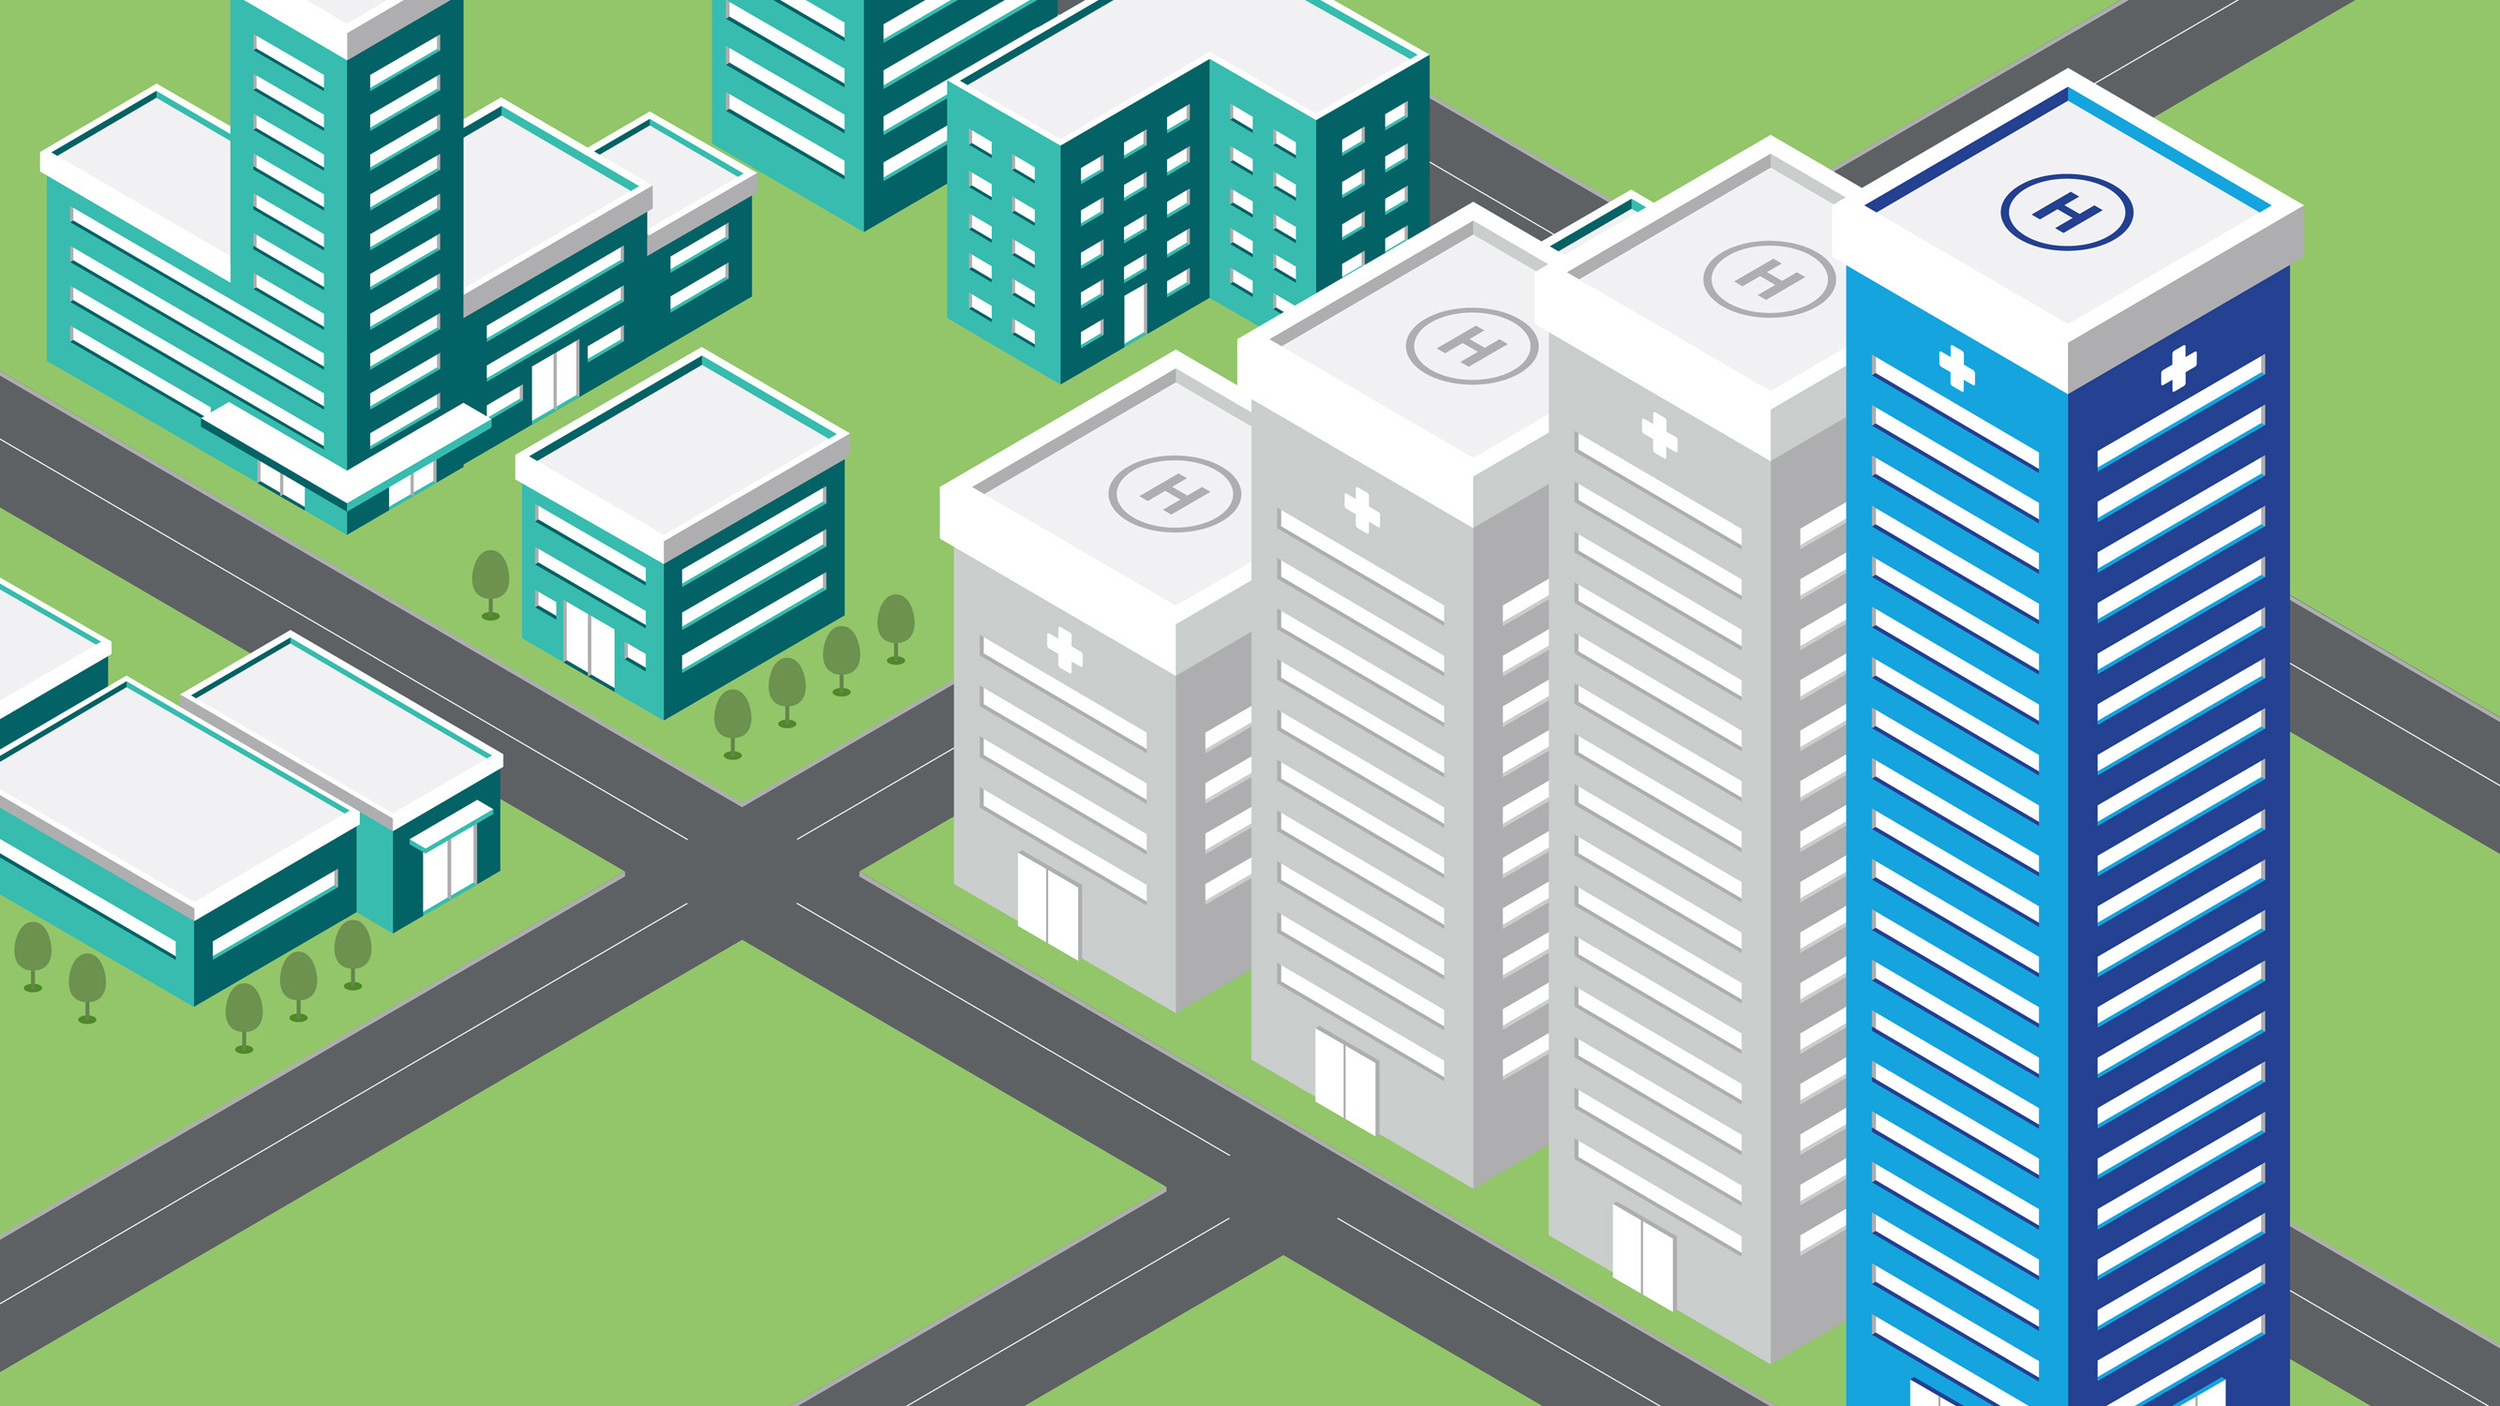 animated_buildings_bar_chart.jpg